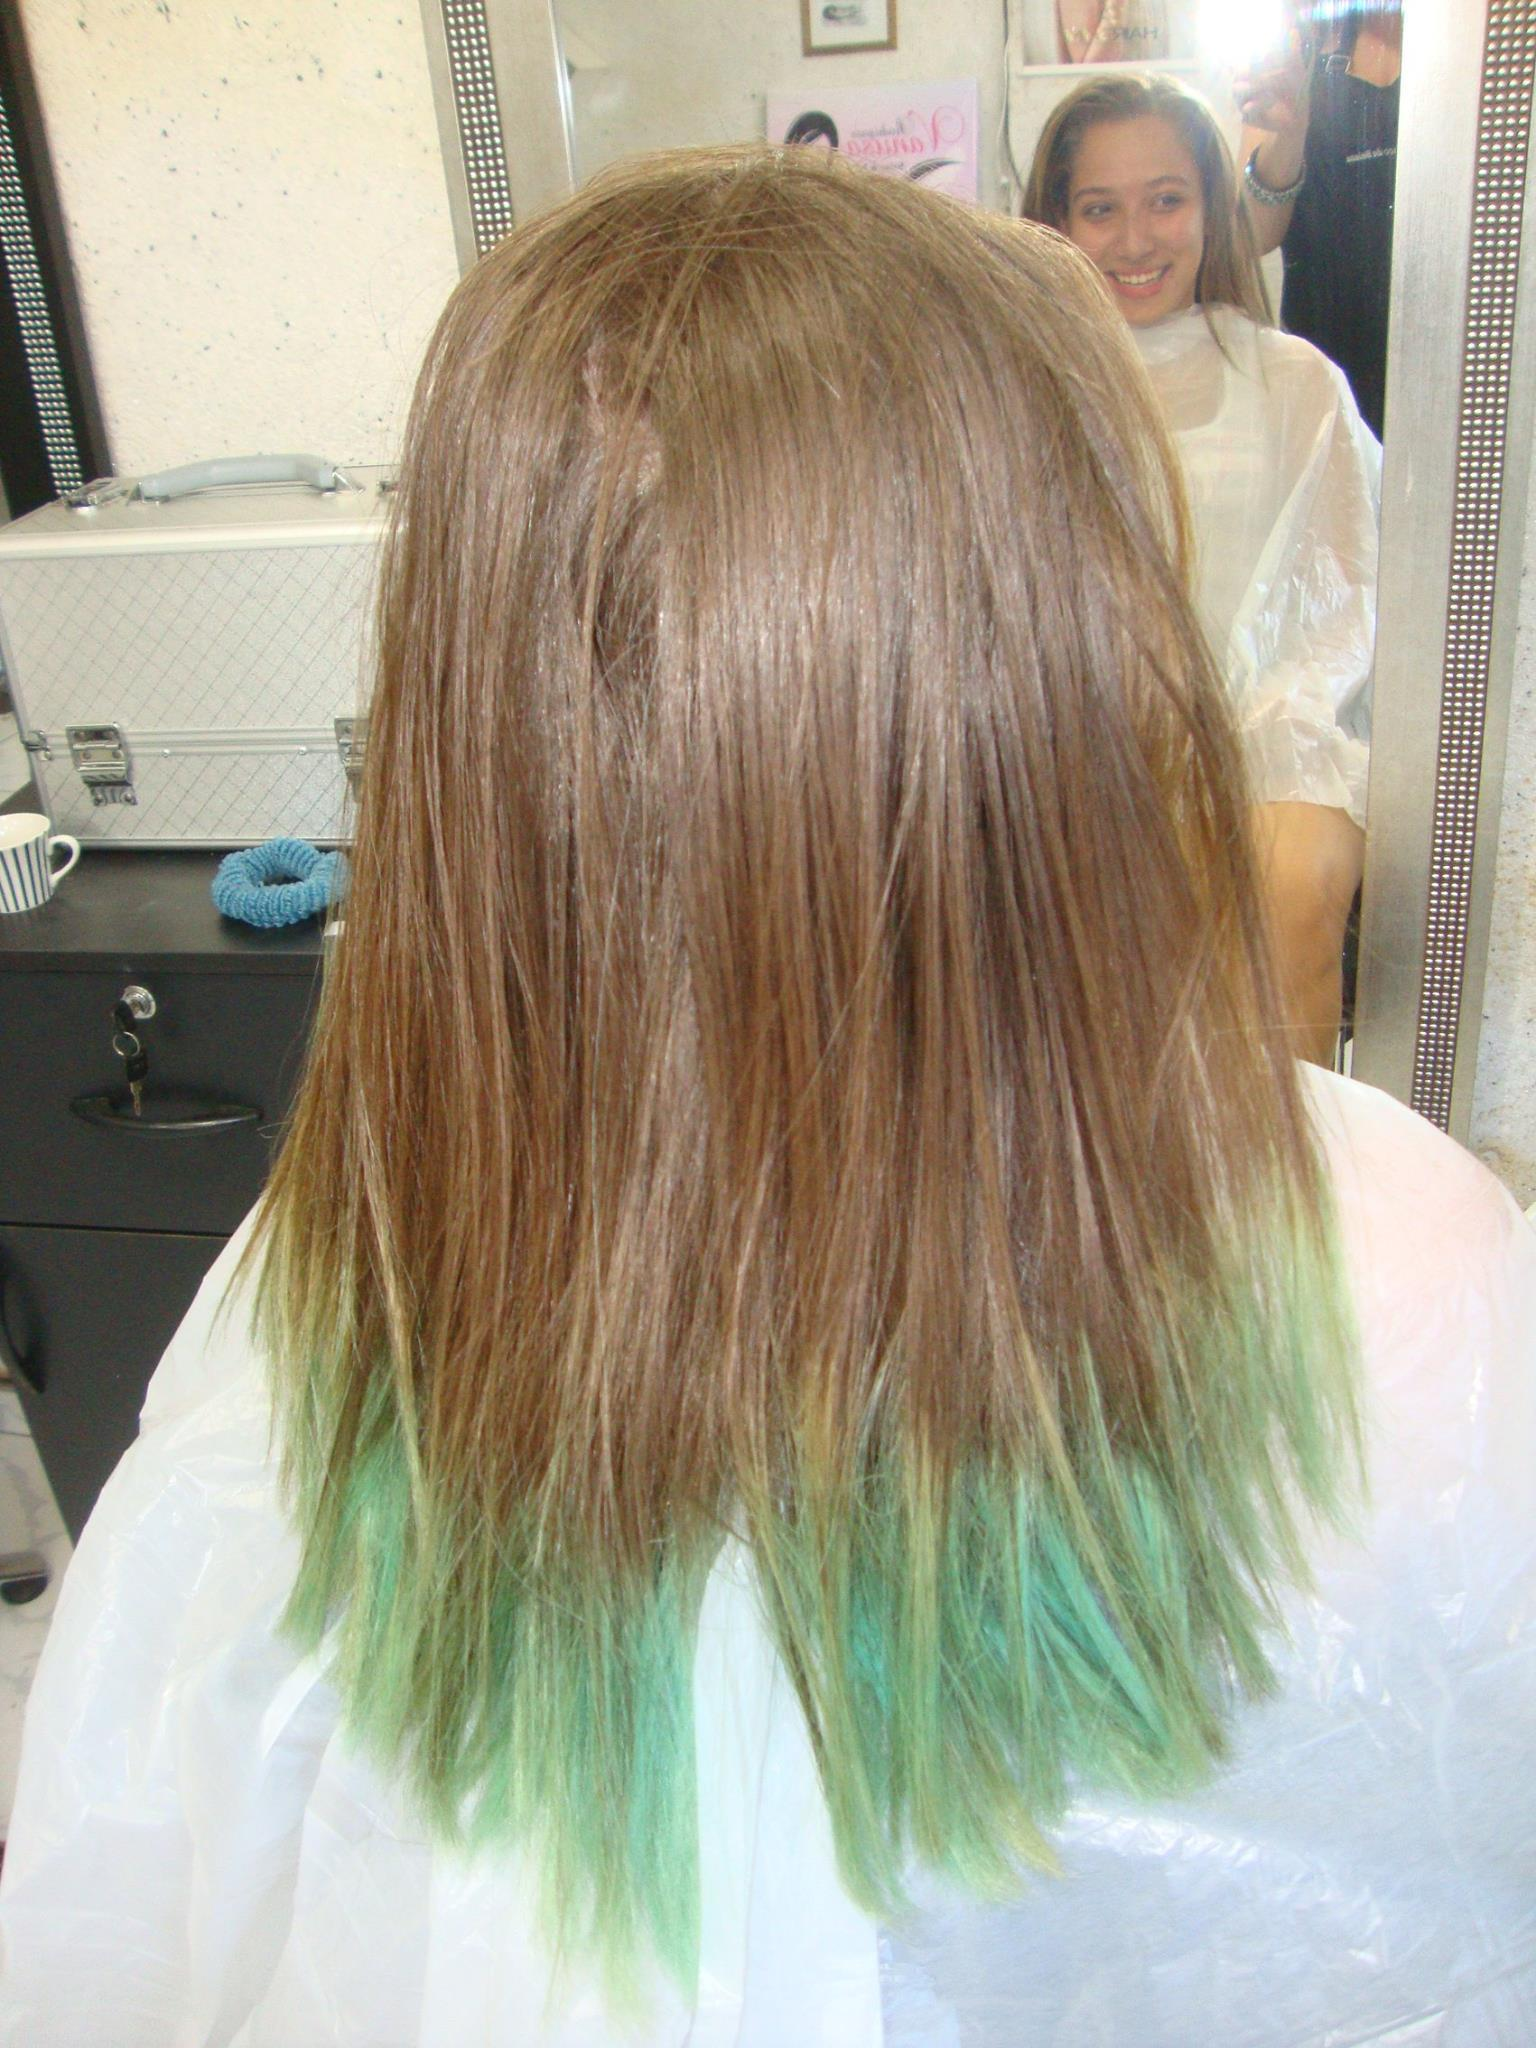 cabelo da ISABELA antes